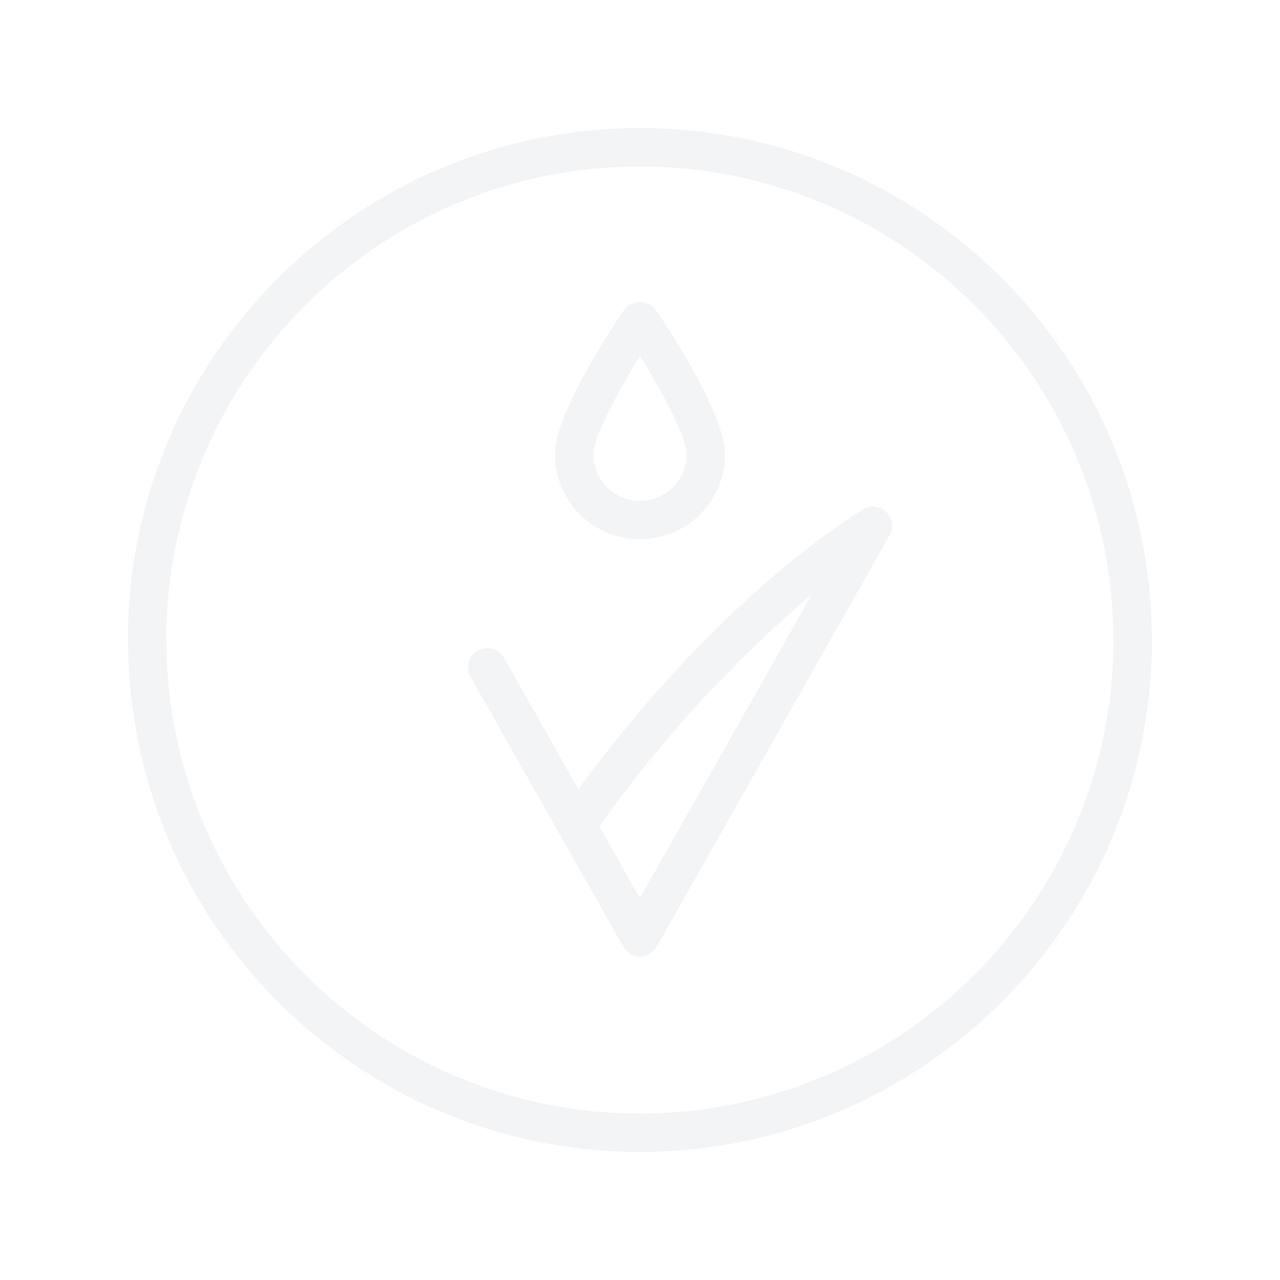 MATRIX R.A.W. Biolage Re-Bodify Clay Mask 400ml